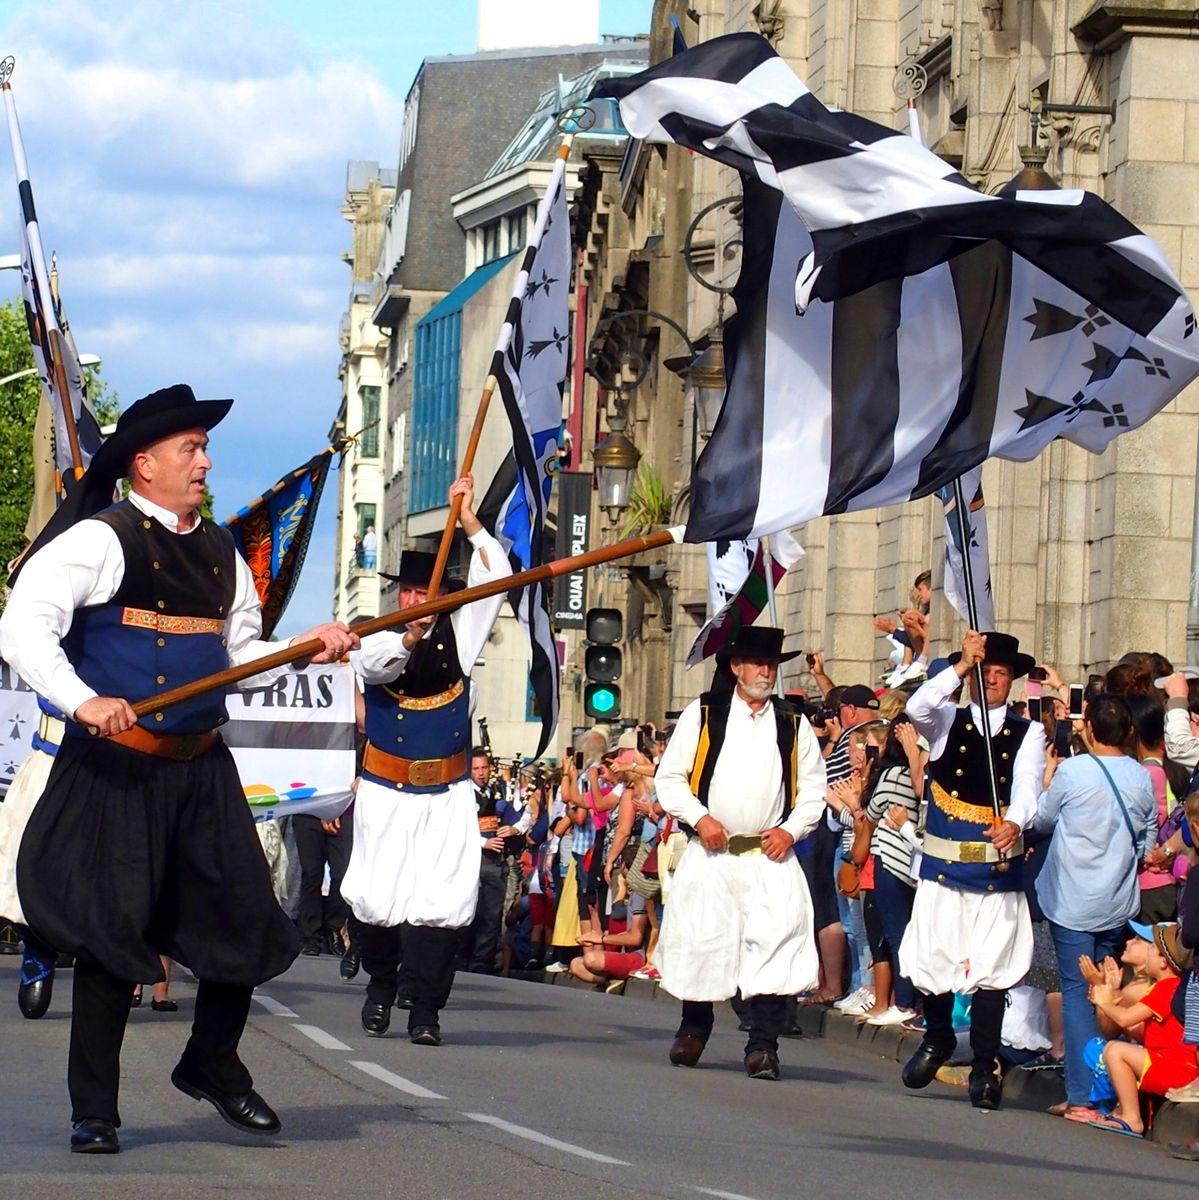 Festival de Cornouailles Quimper Bretagne